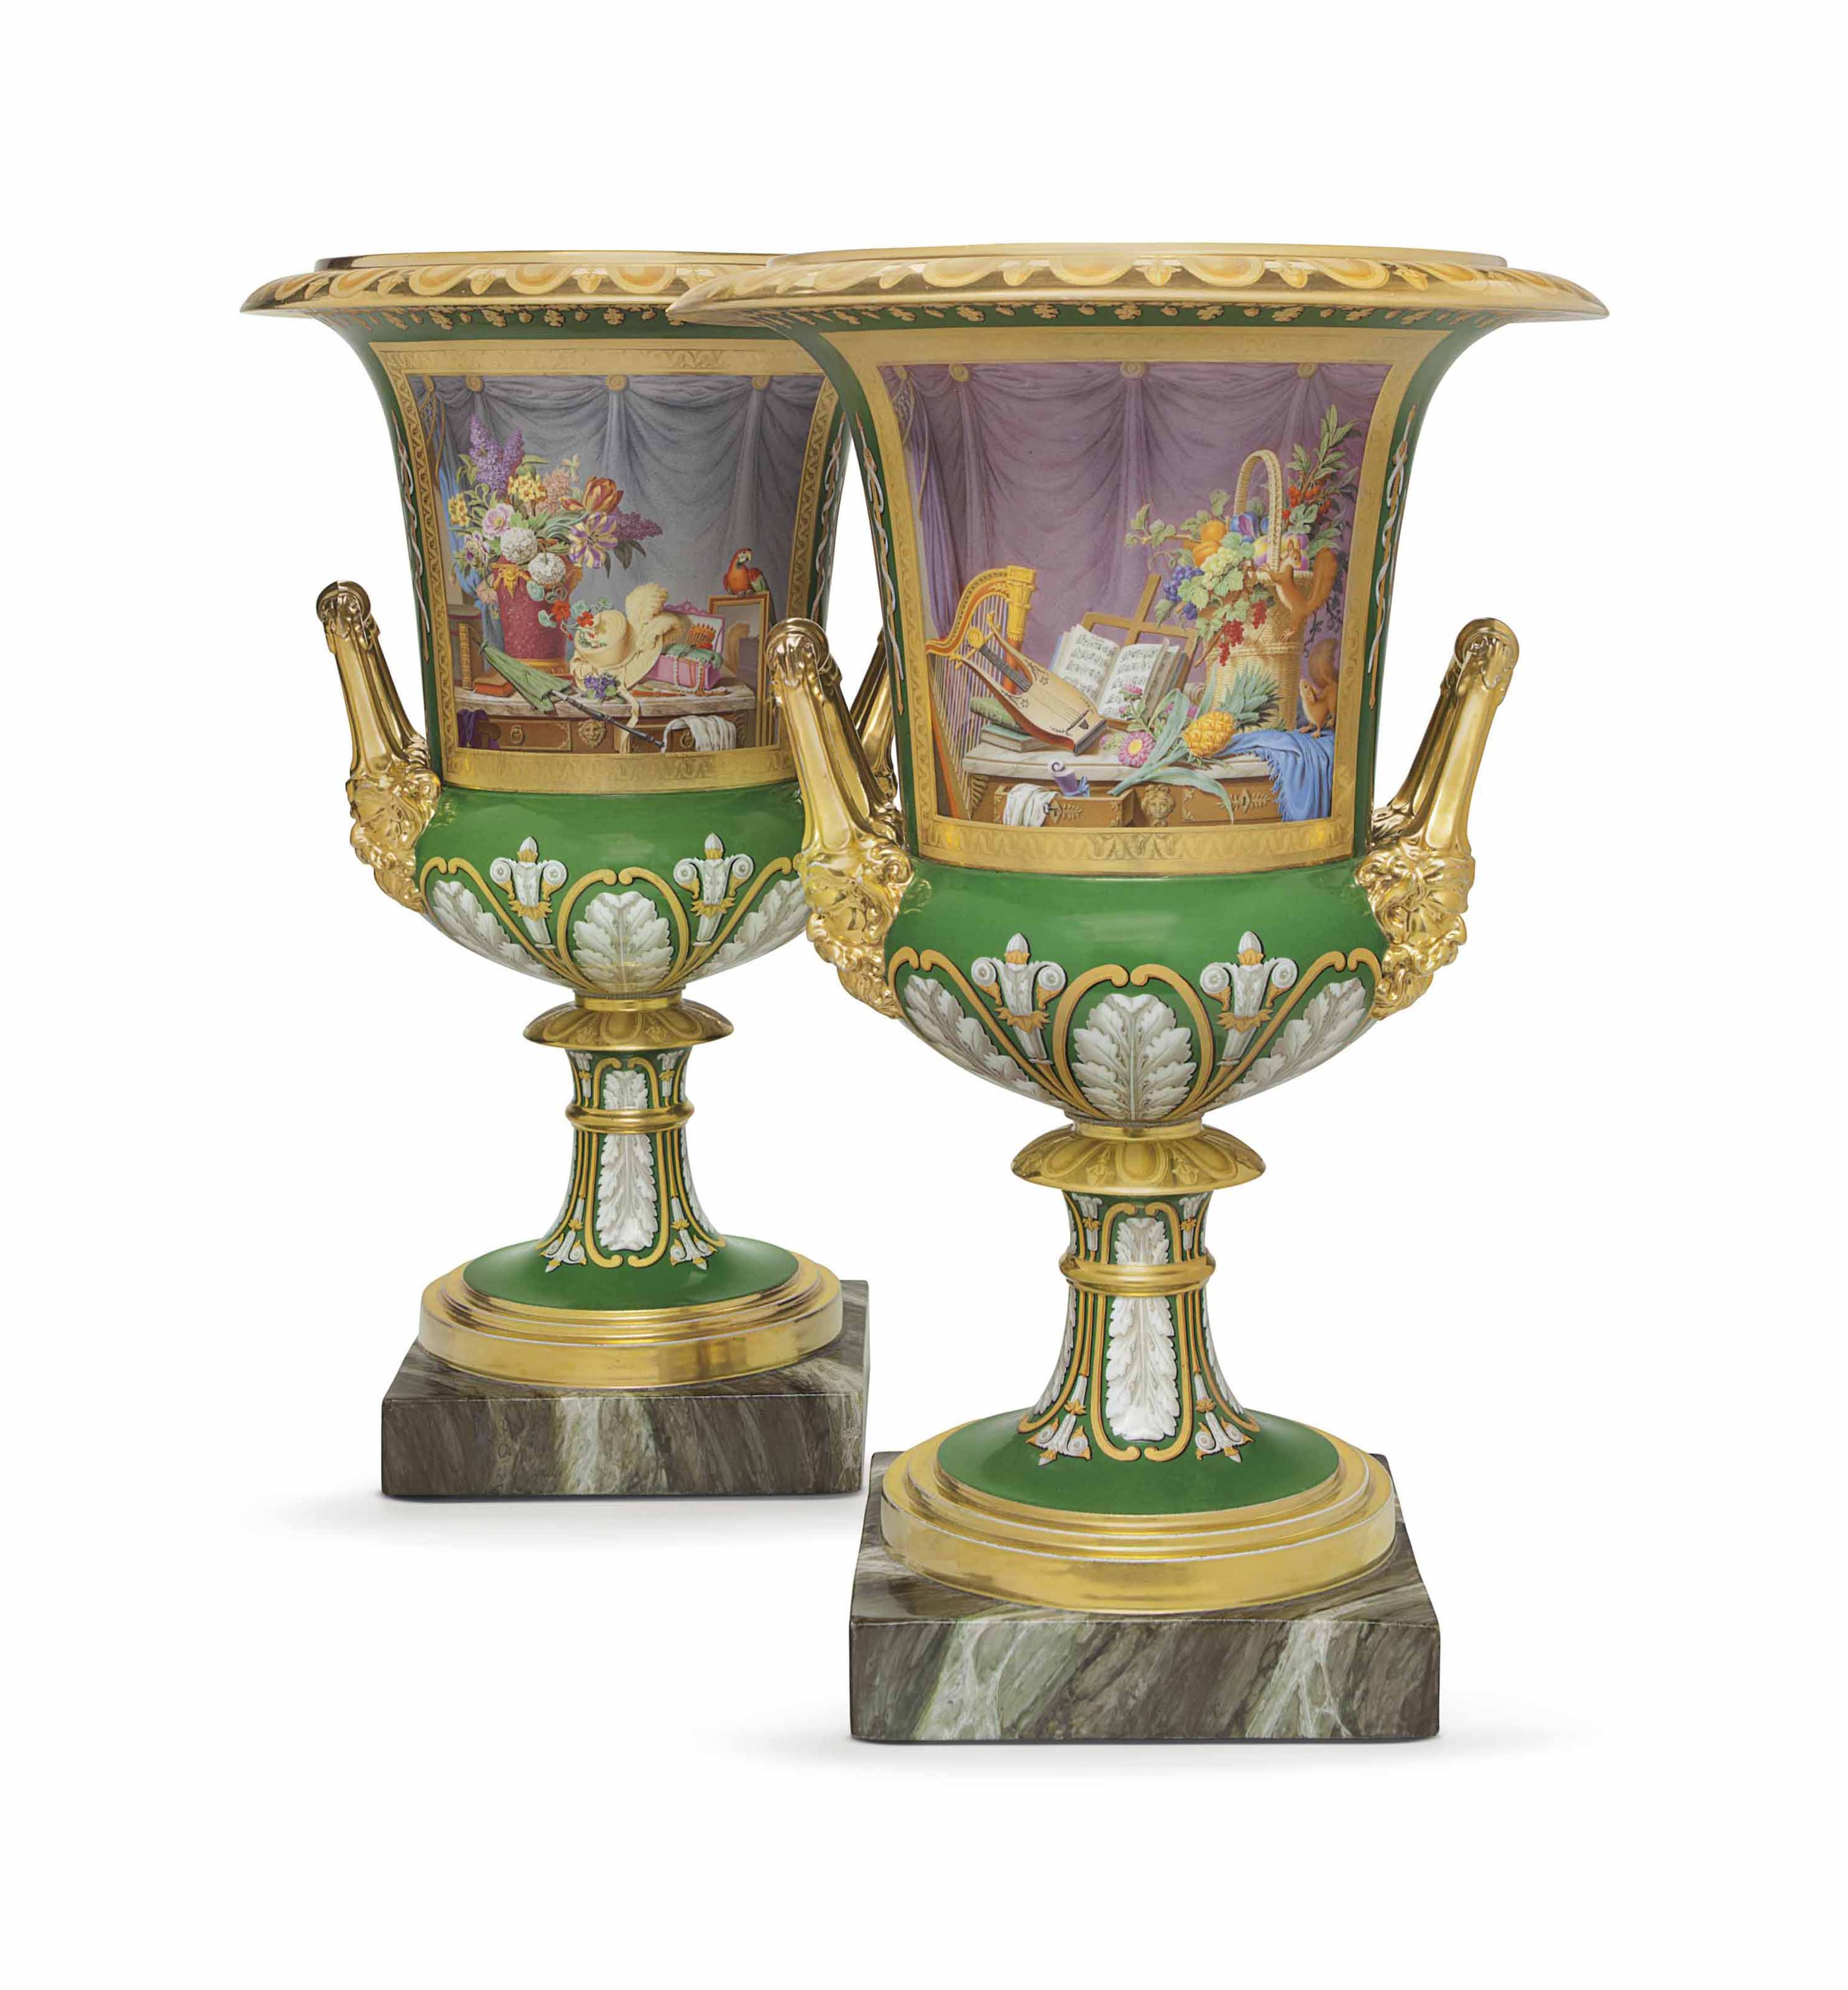 A PAIR OF PARIS (DARTE FRERES) PORCELAIN GREEN AND GOLD GROUND CAMPANA VASES